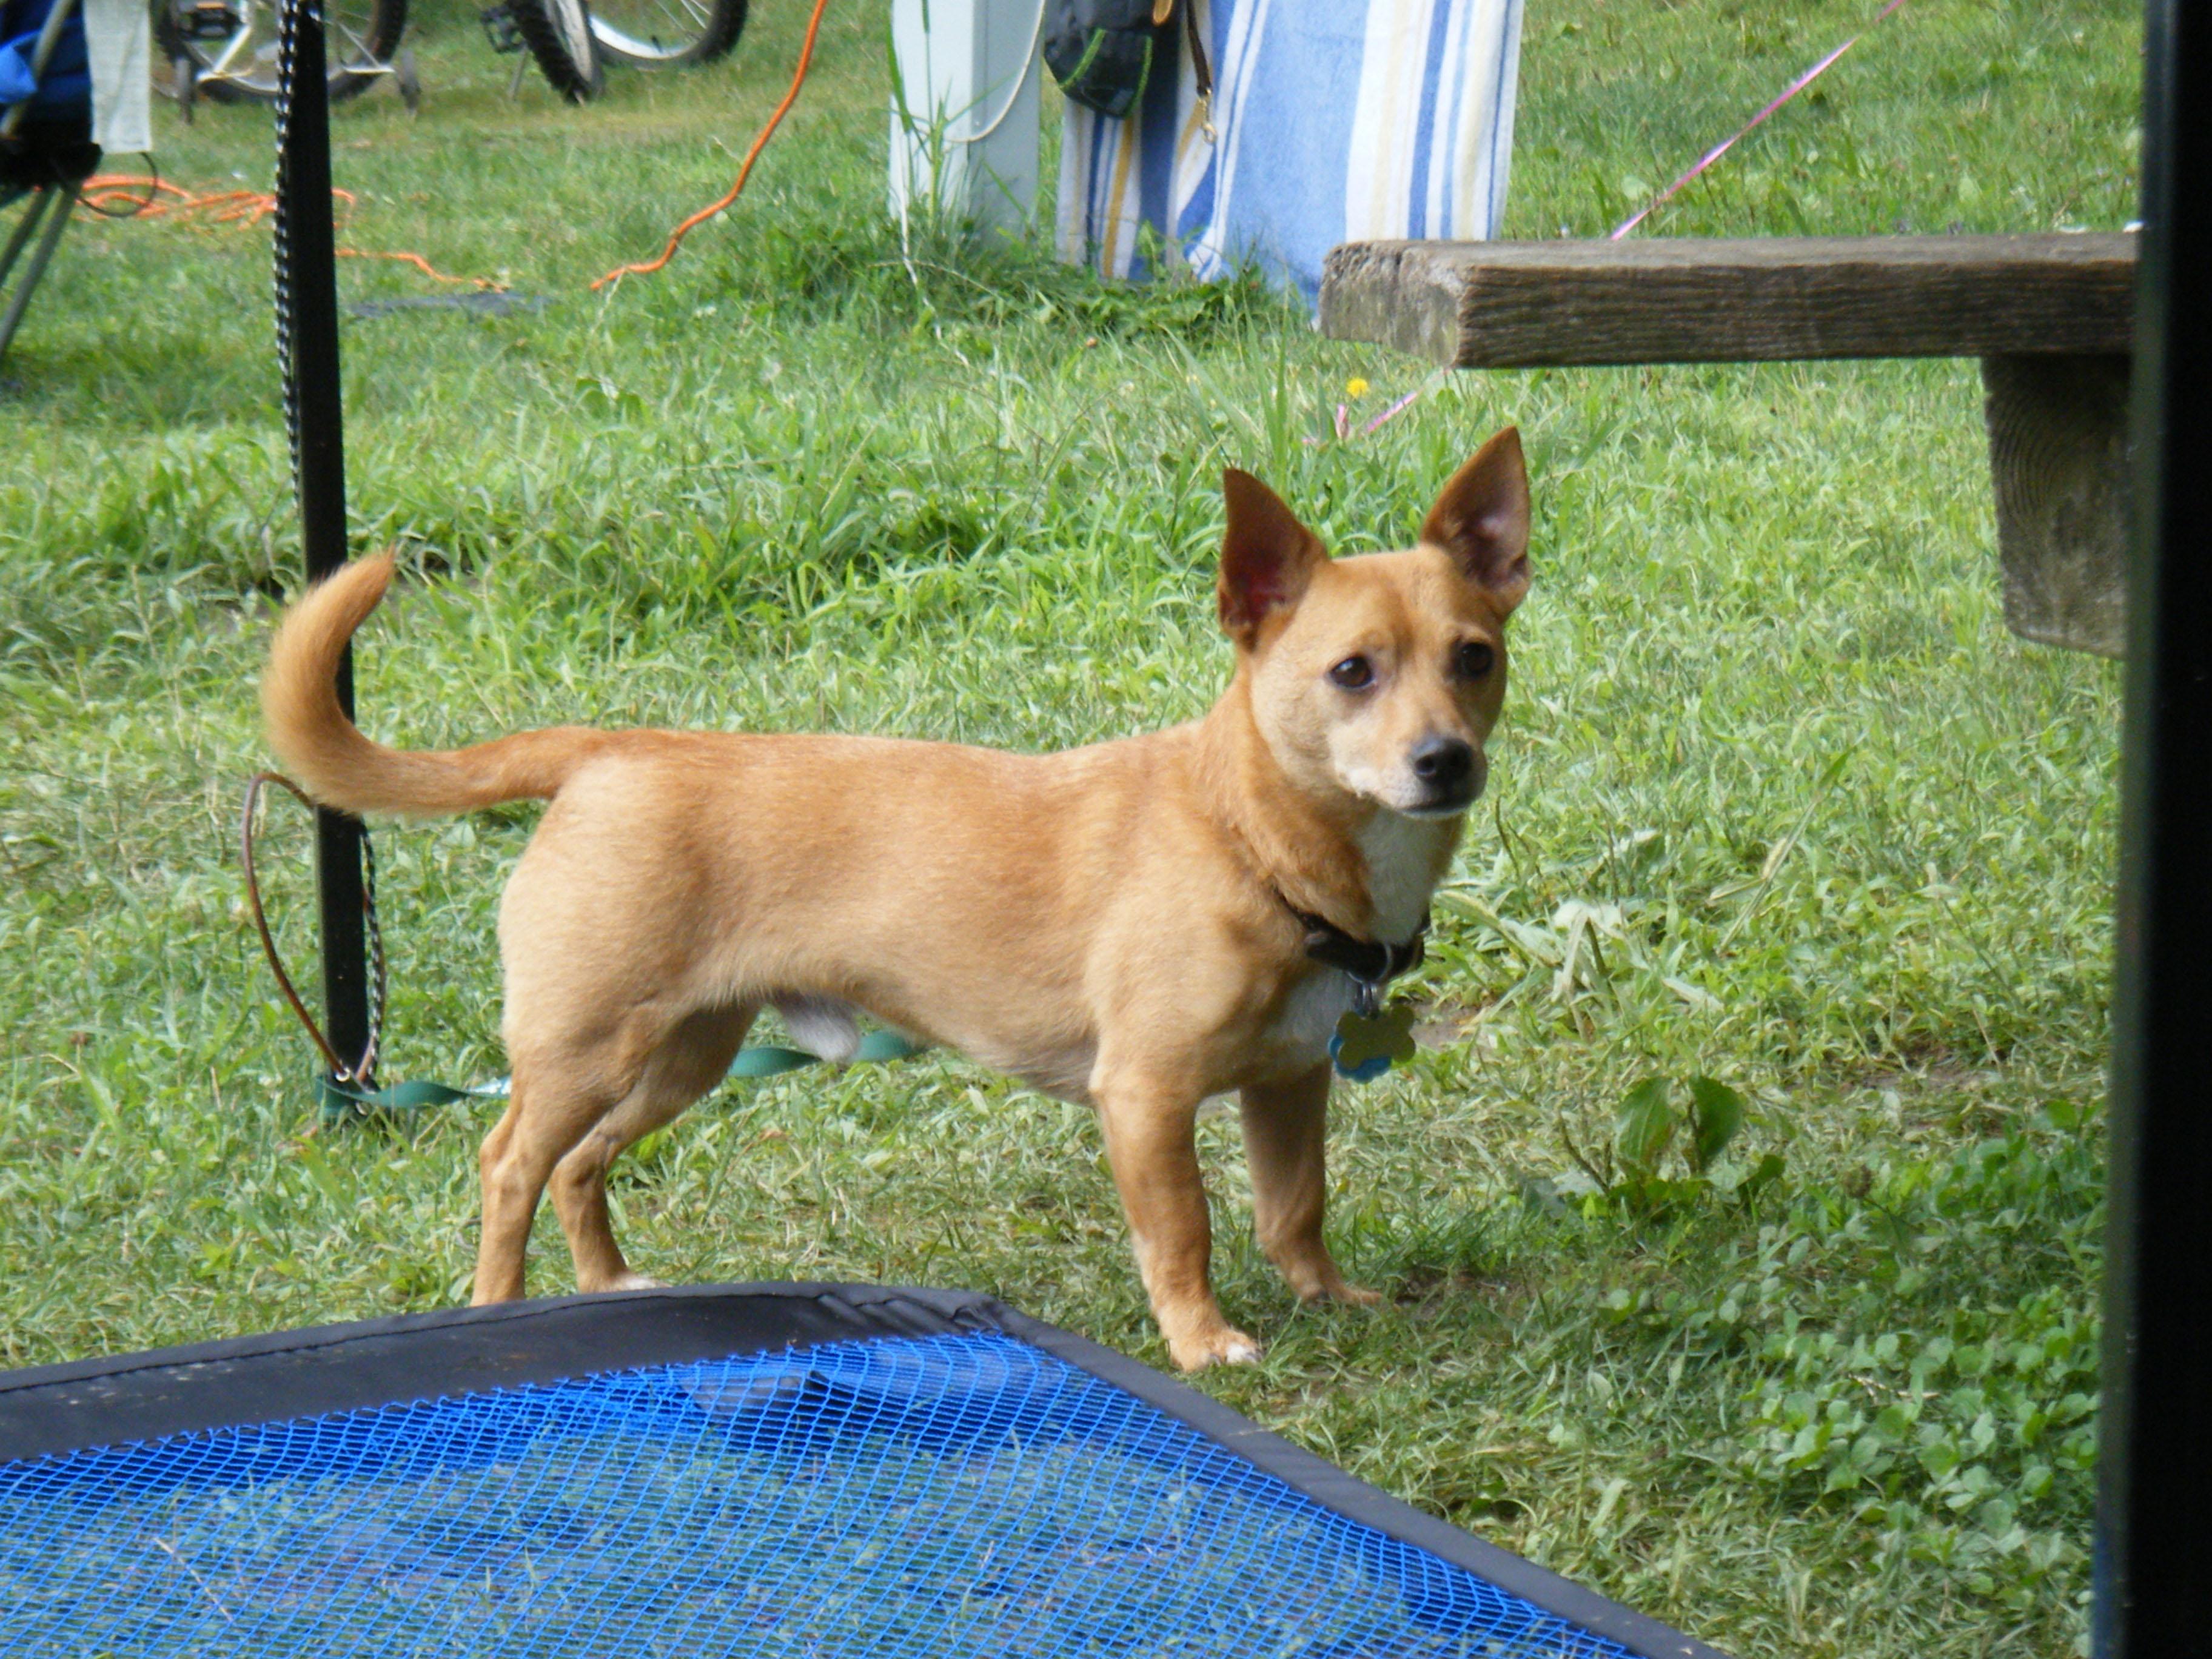 ... is a chihuahua dachshund mix chiuaua weiner dog mix chihuahua wiener